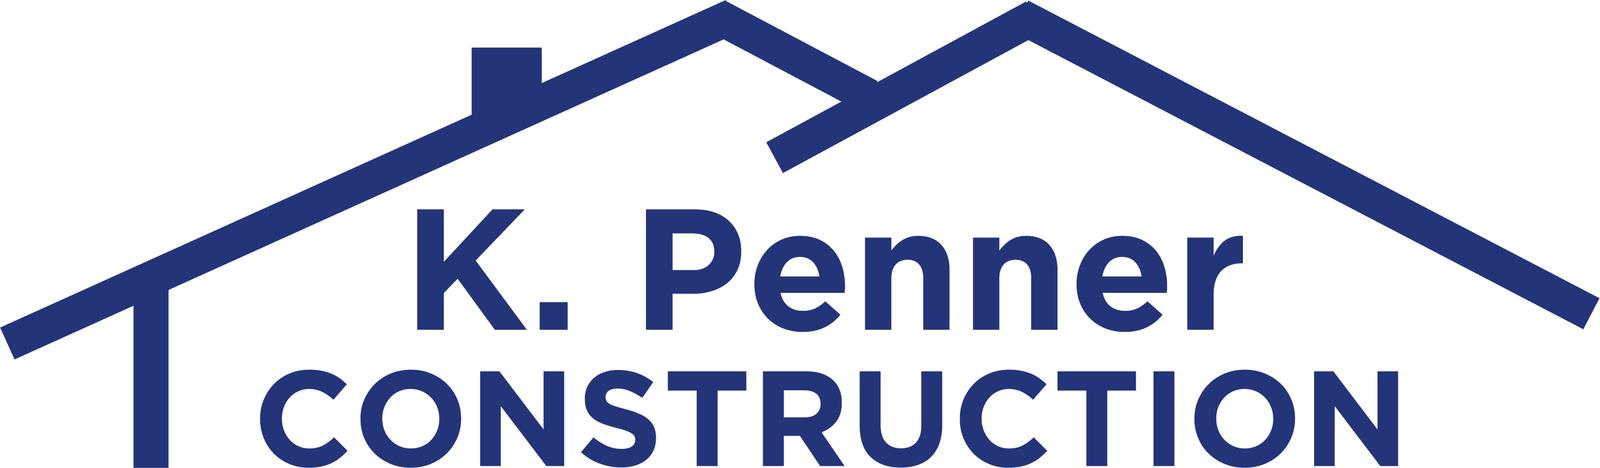 K Penner Construction